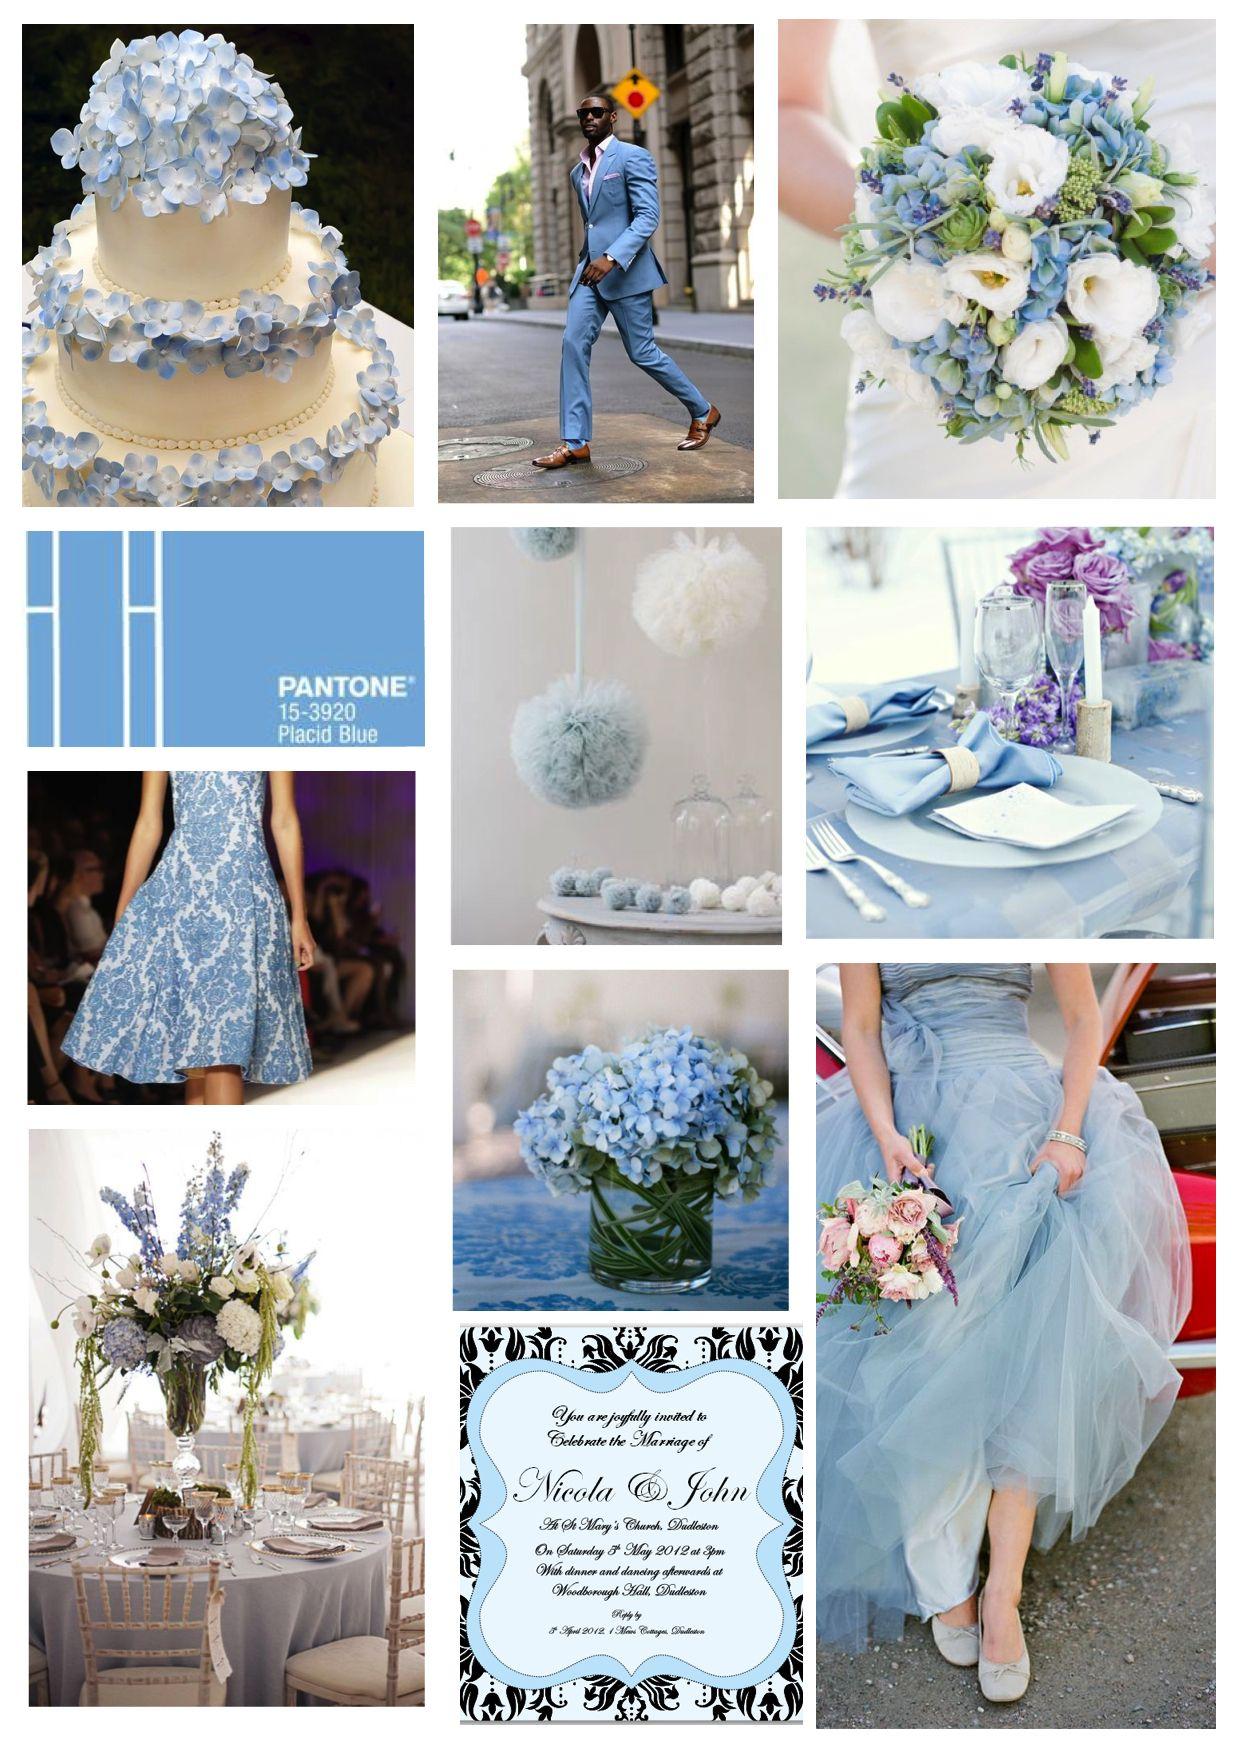 Pantone Placid Blue Wedding ideas See more ideas: http://www ...